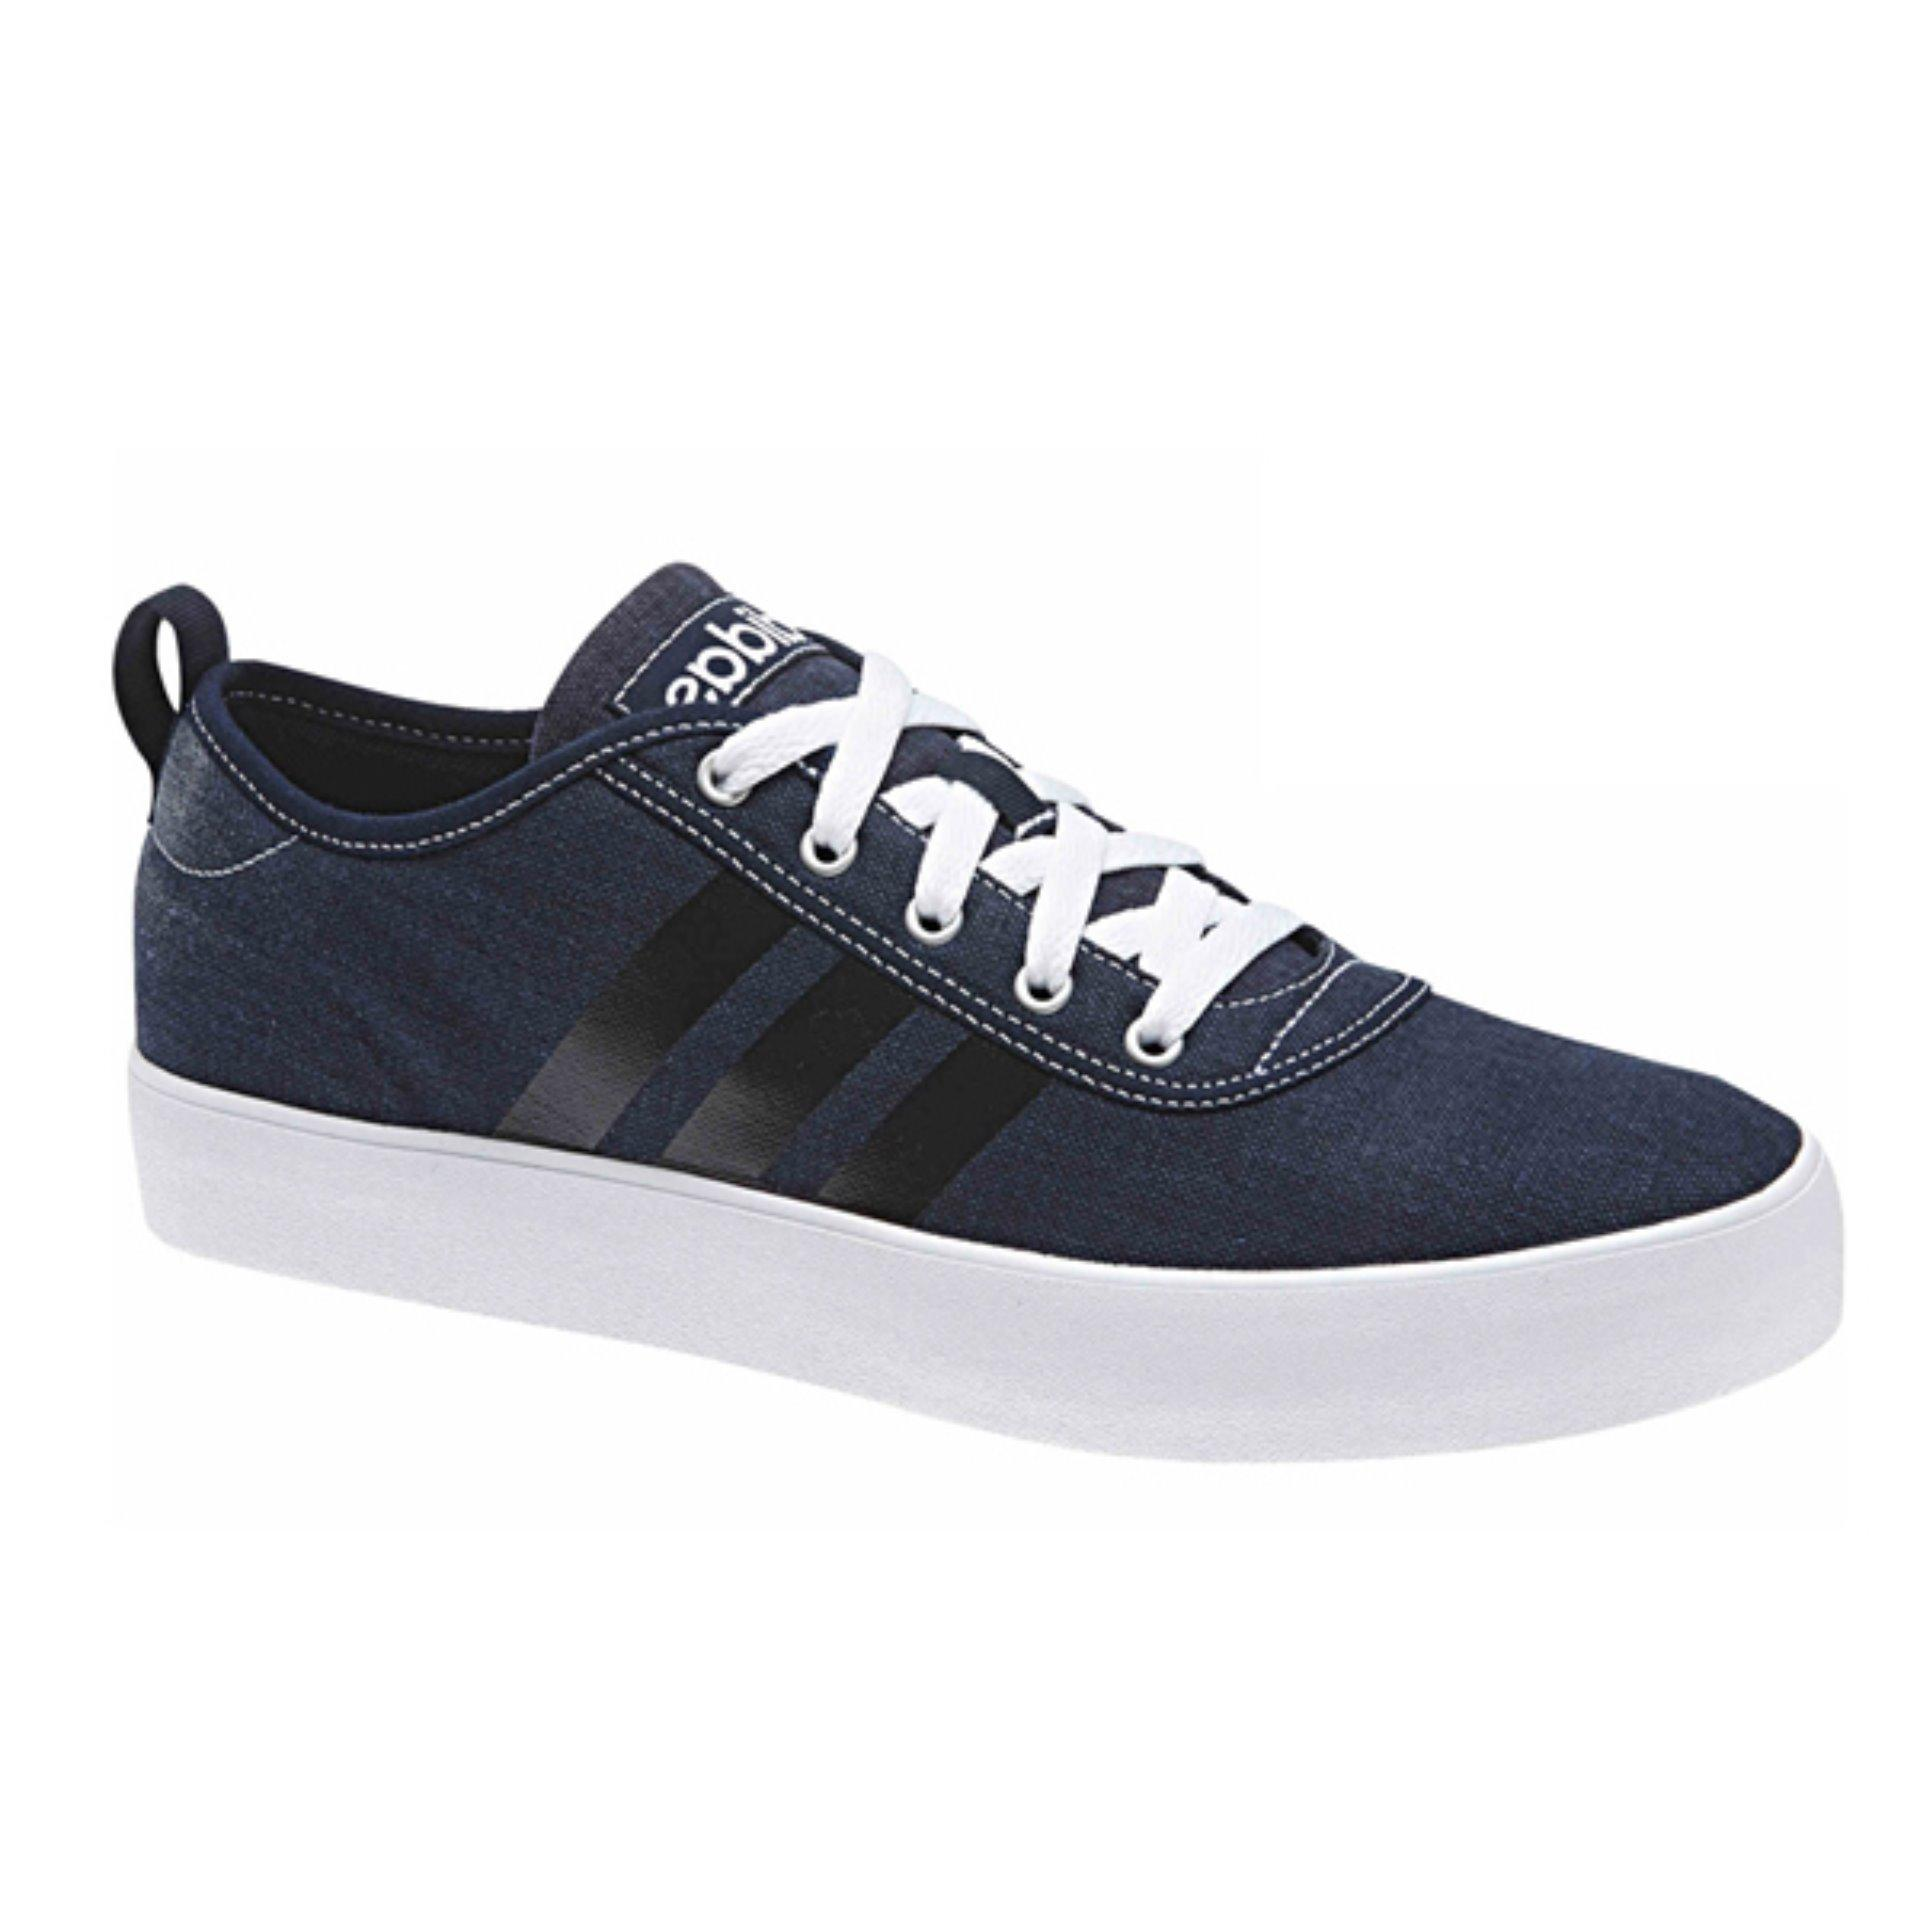 Jual Adidas Sepatu Sneaker Neosole Aw3938 Navy Di Dki Jakarta